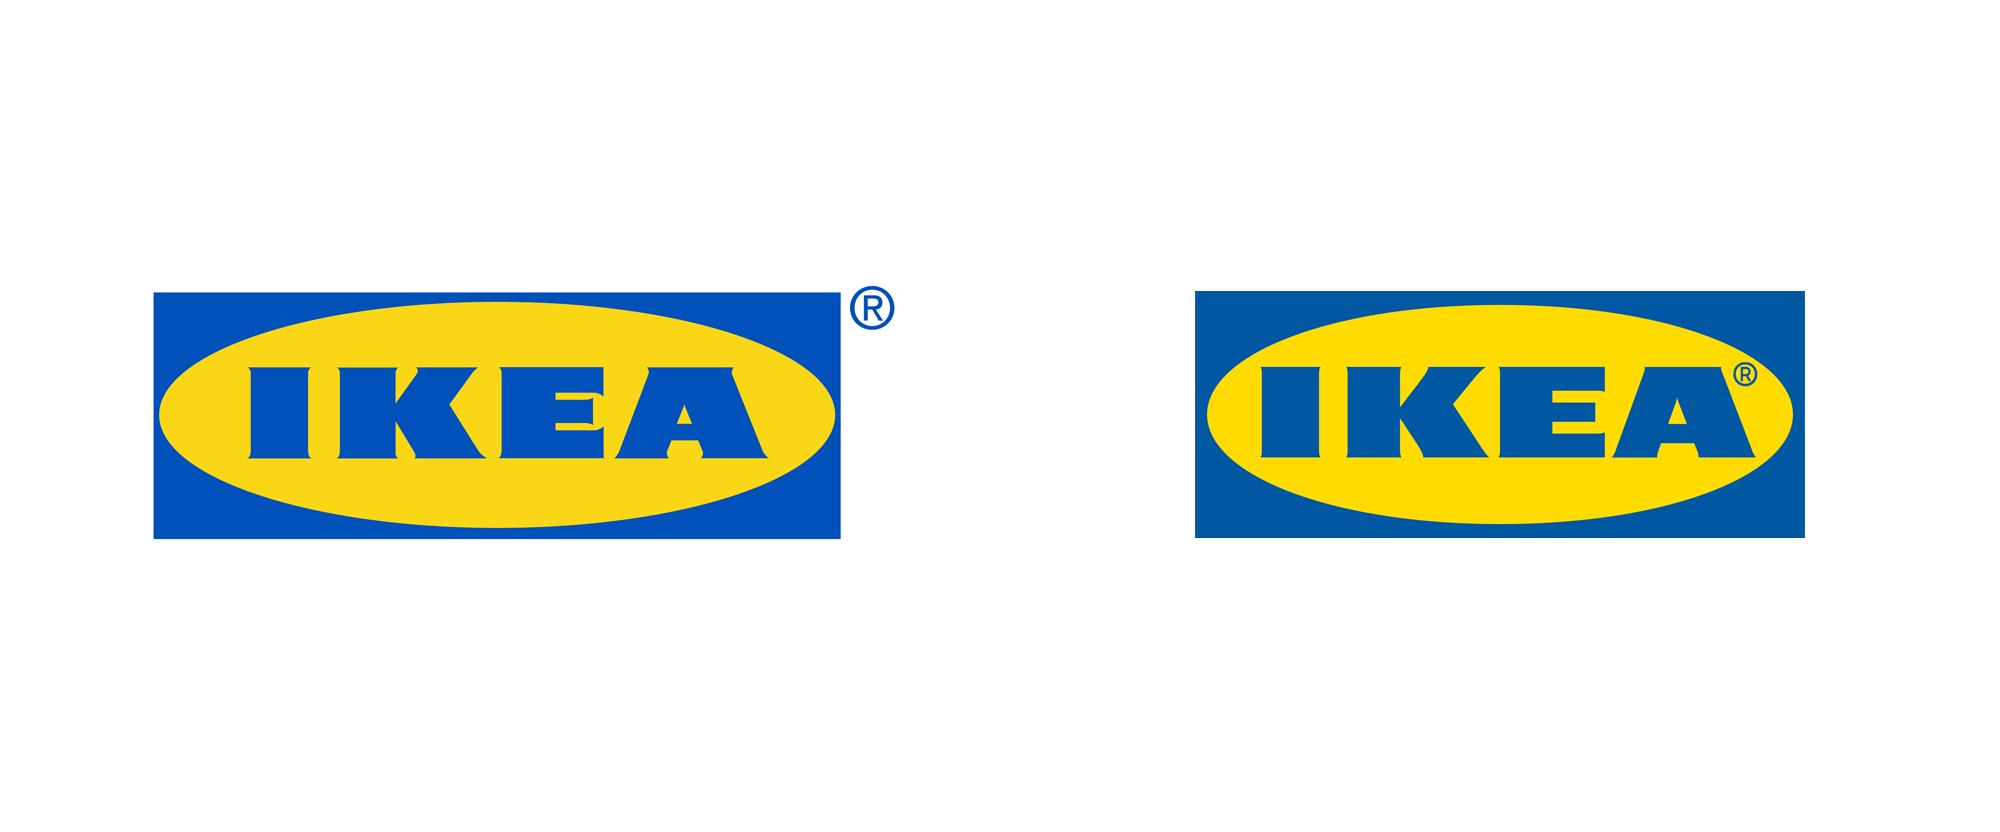 Ikea Marked The Change New Logo For Ikea 138042 Xyz The Design Ikea Logo Diy Furniture Plans Ikea New